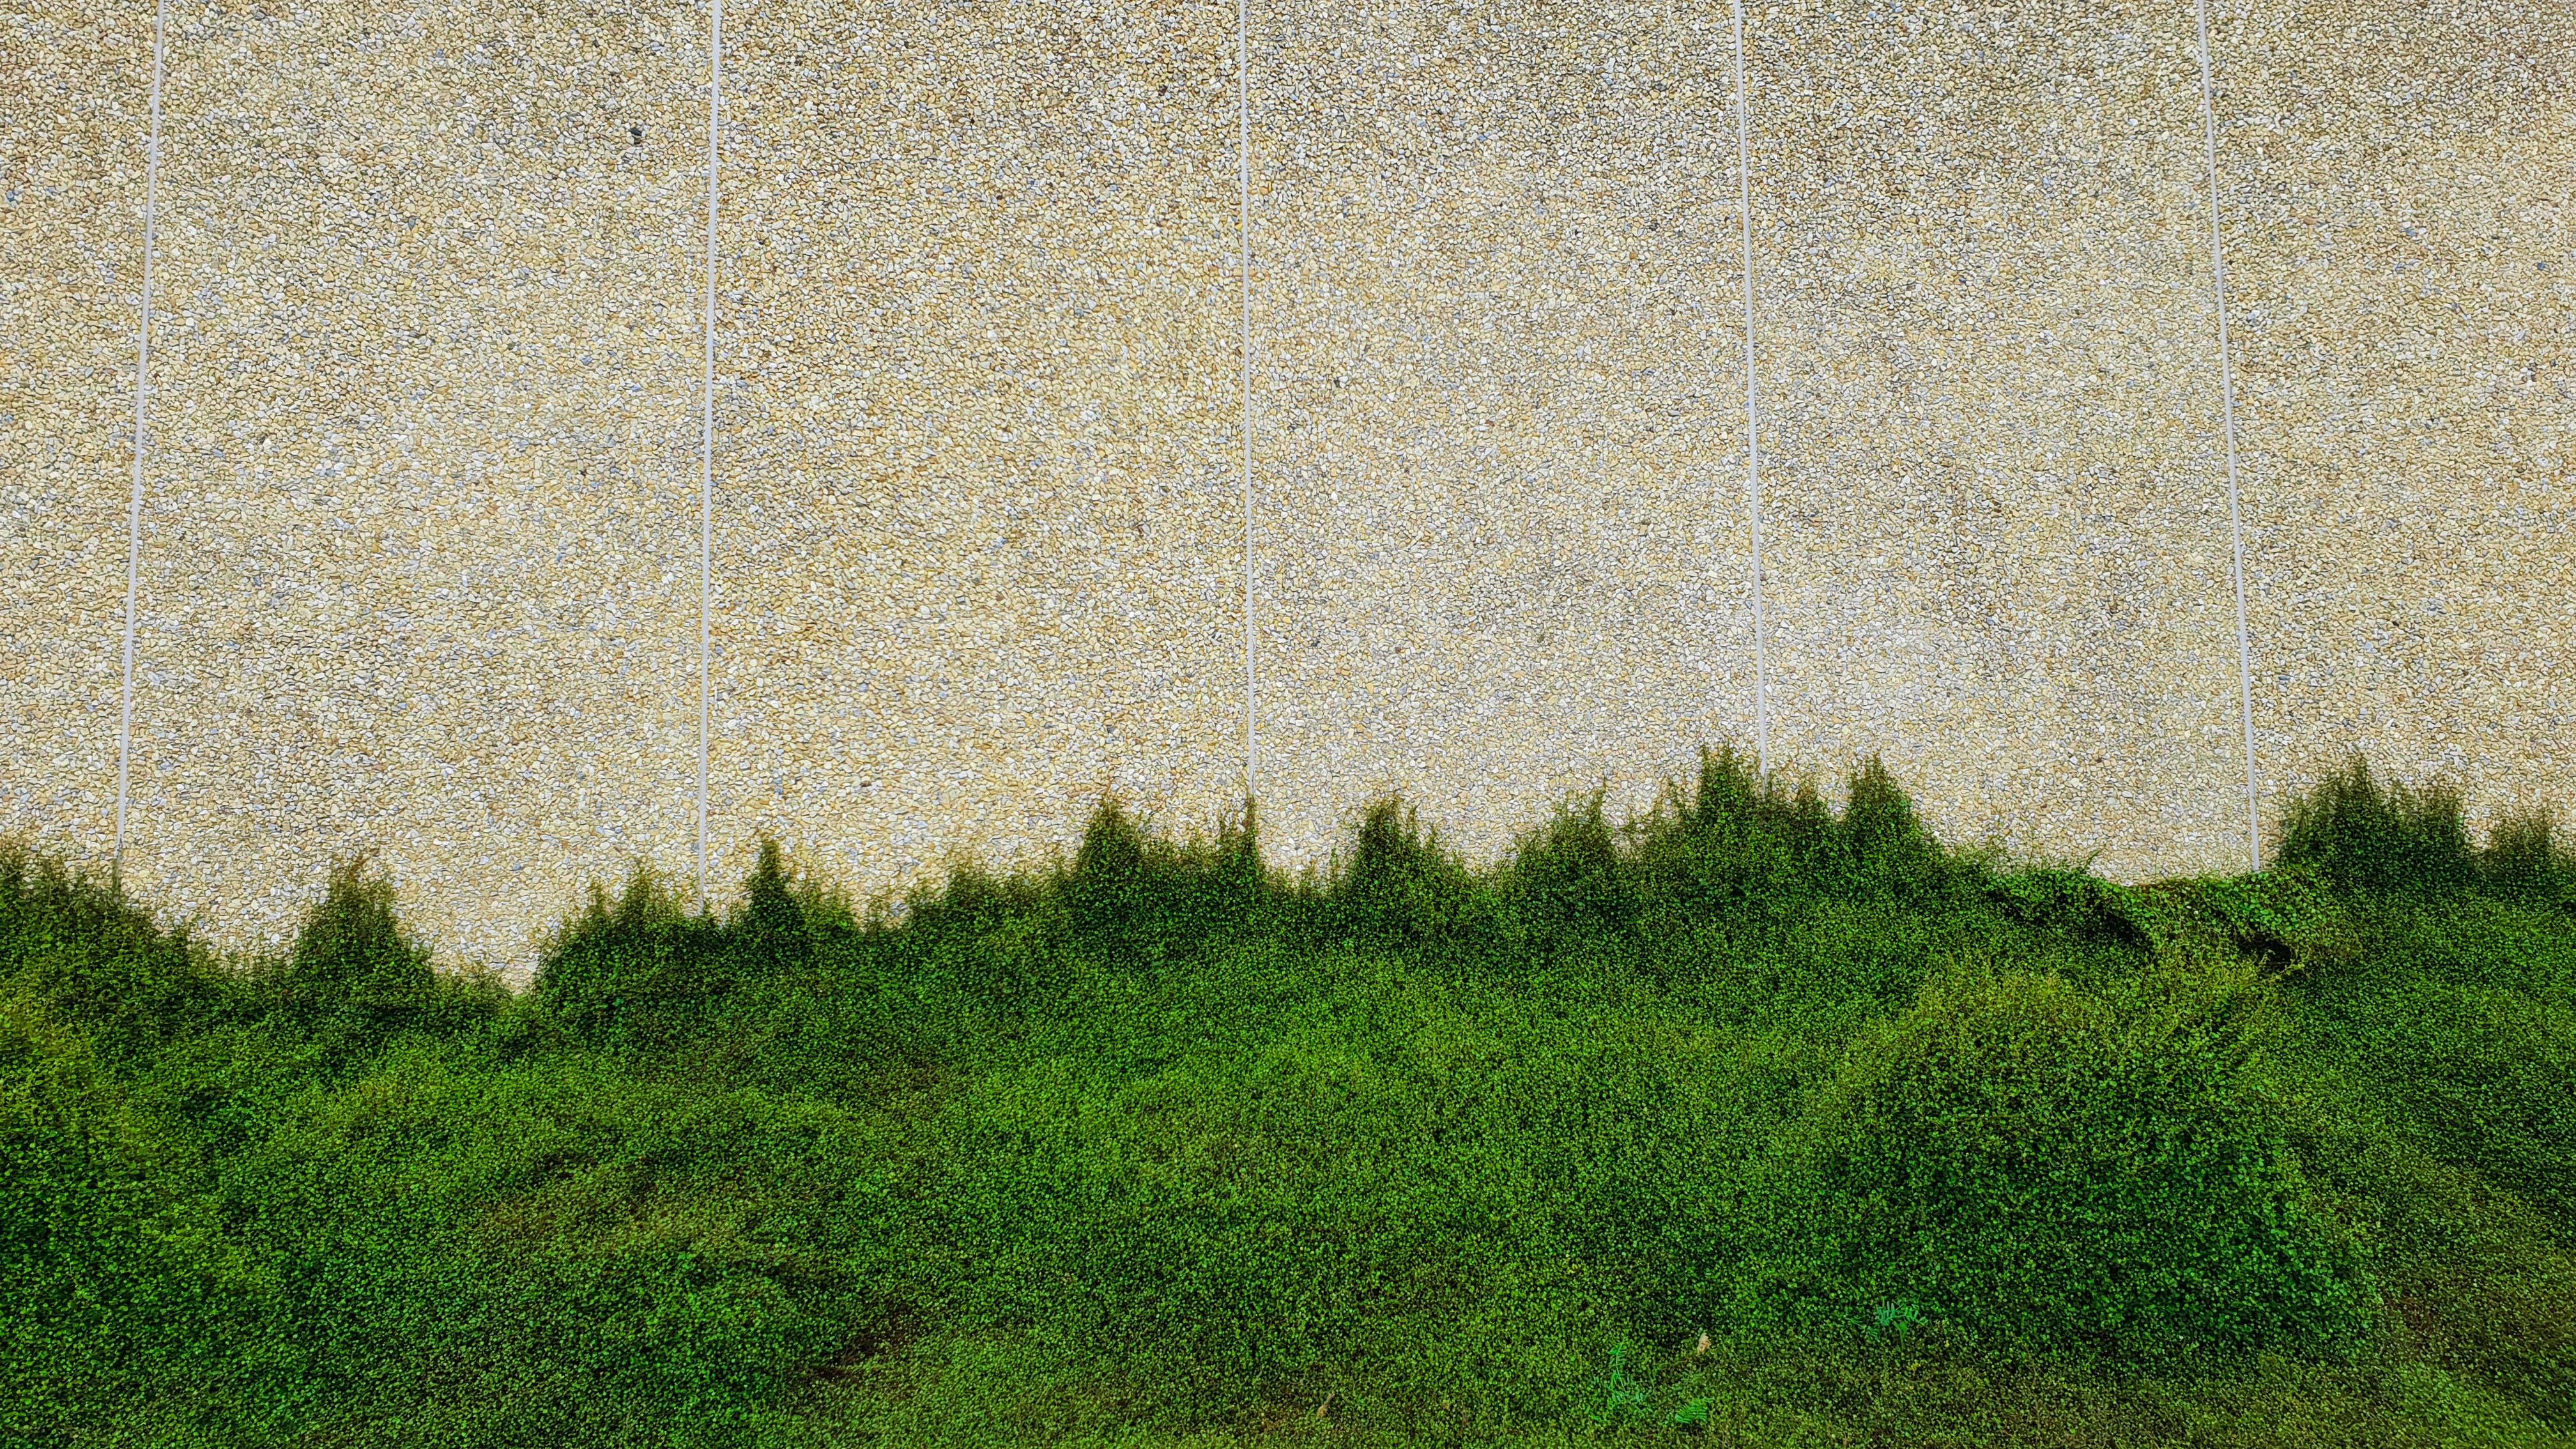 Kostenloses Stock Foto zu backsteinmauer, betonmauer, busch, grüne wand